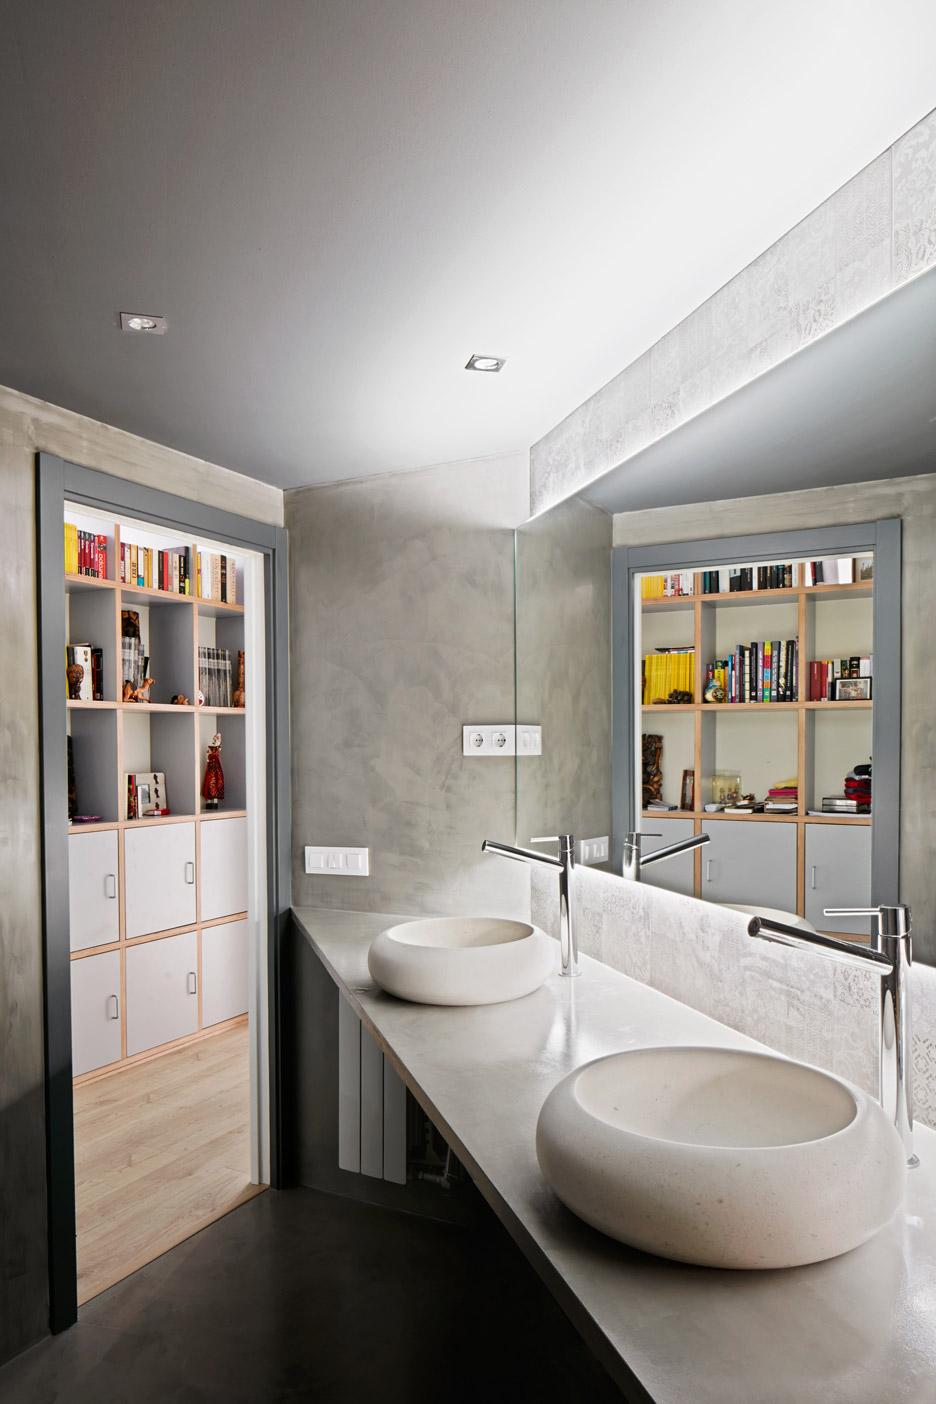 architecture_ open_layout__design_studia_interiors_osnovadesign_osnova_poltava_10